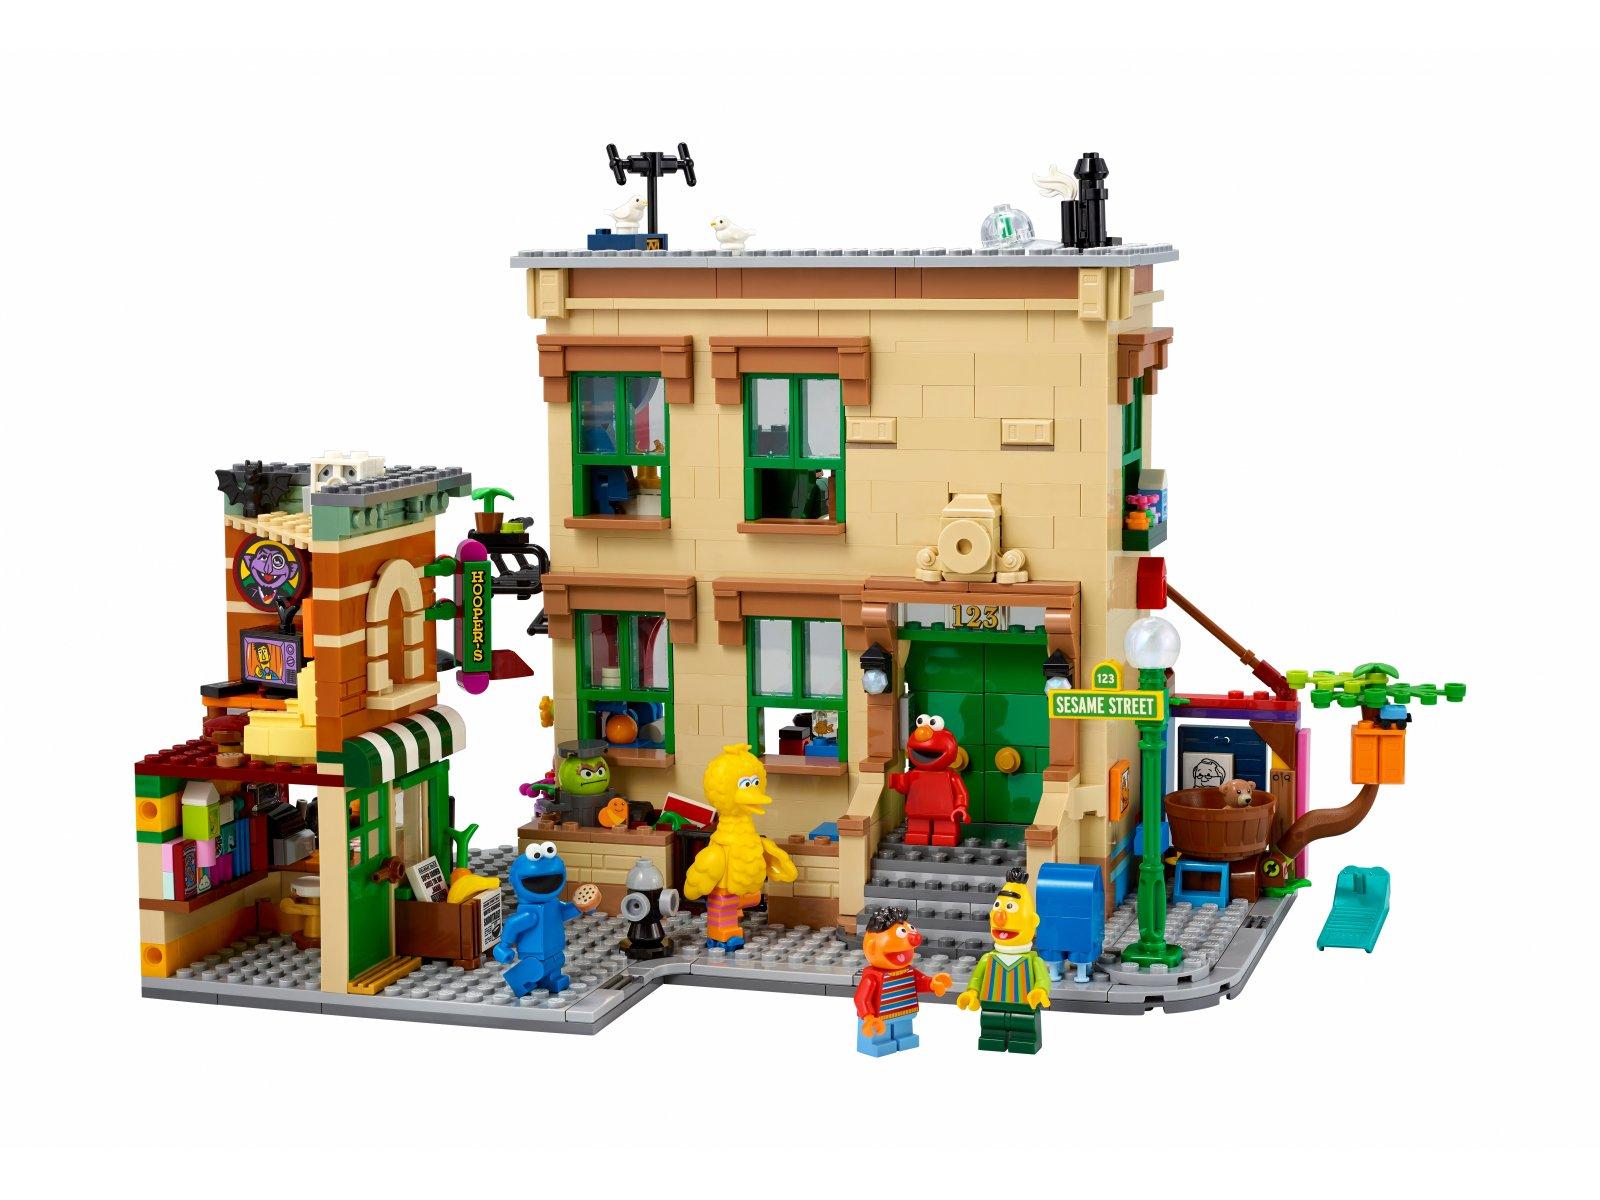 LEGO 21324 123 Sesame Street